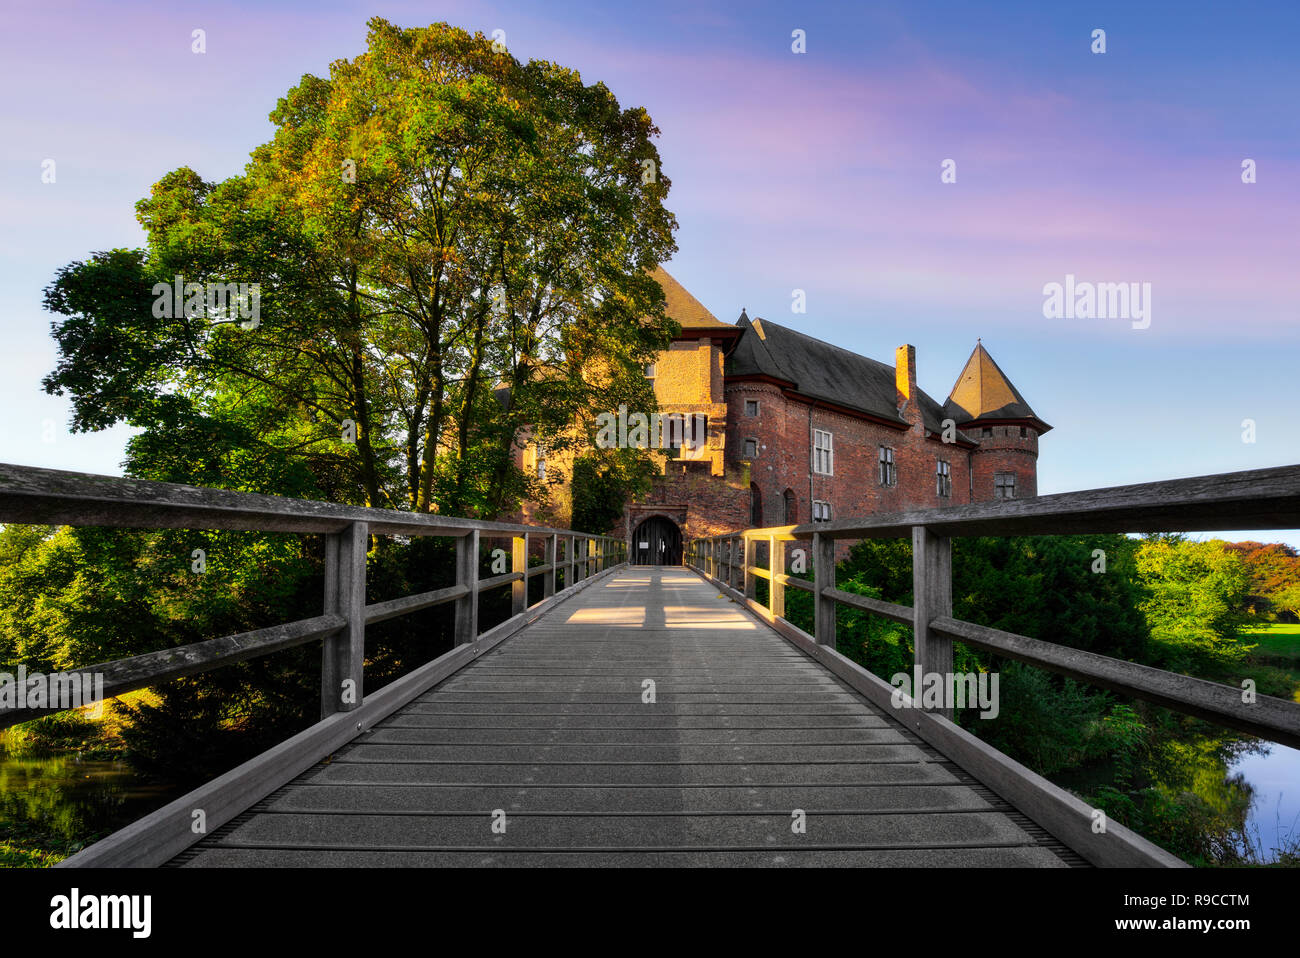 Burg Linn Castle, Krefeld, North Rhine-Westphalia, Germany - Stock Image